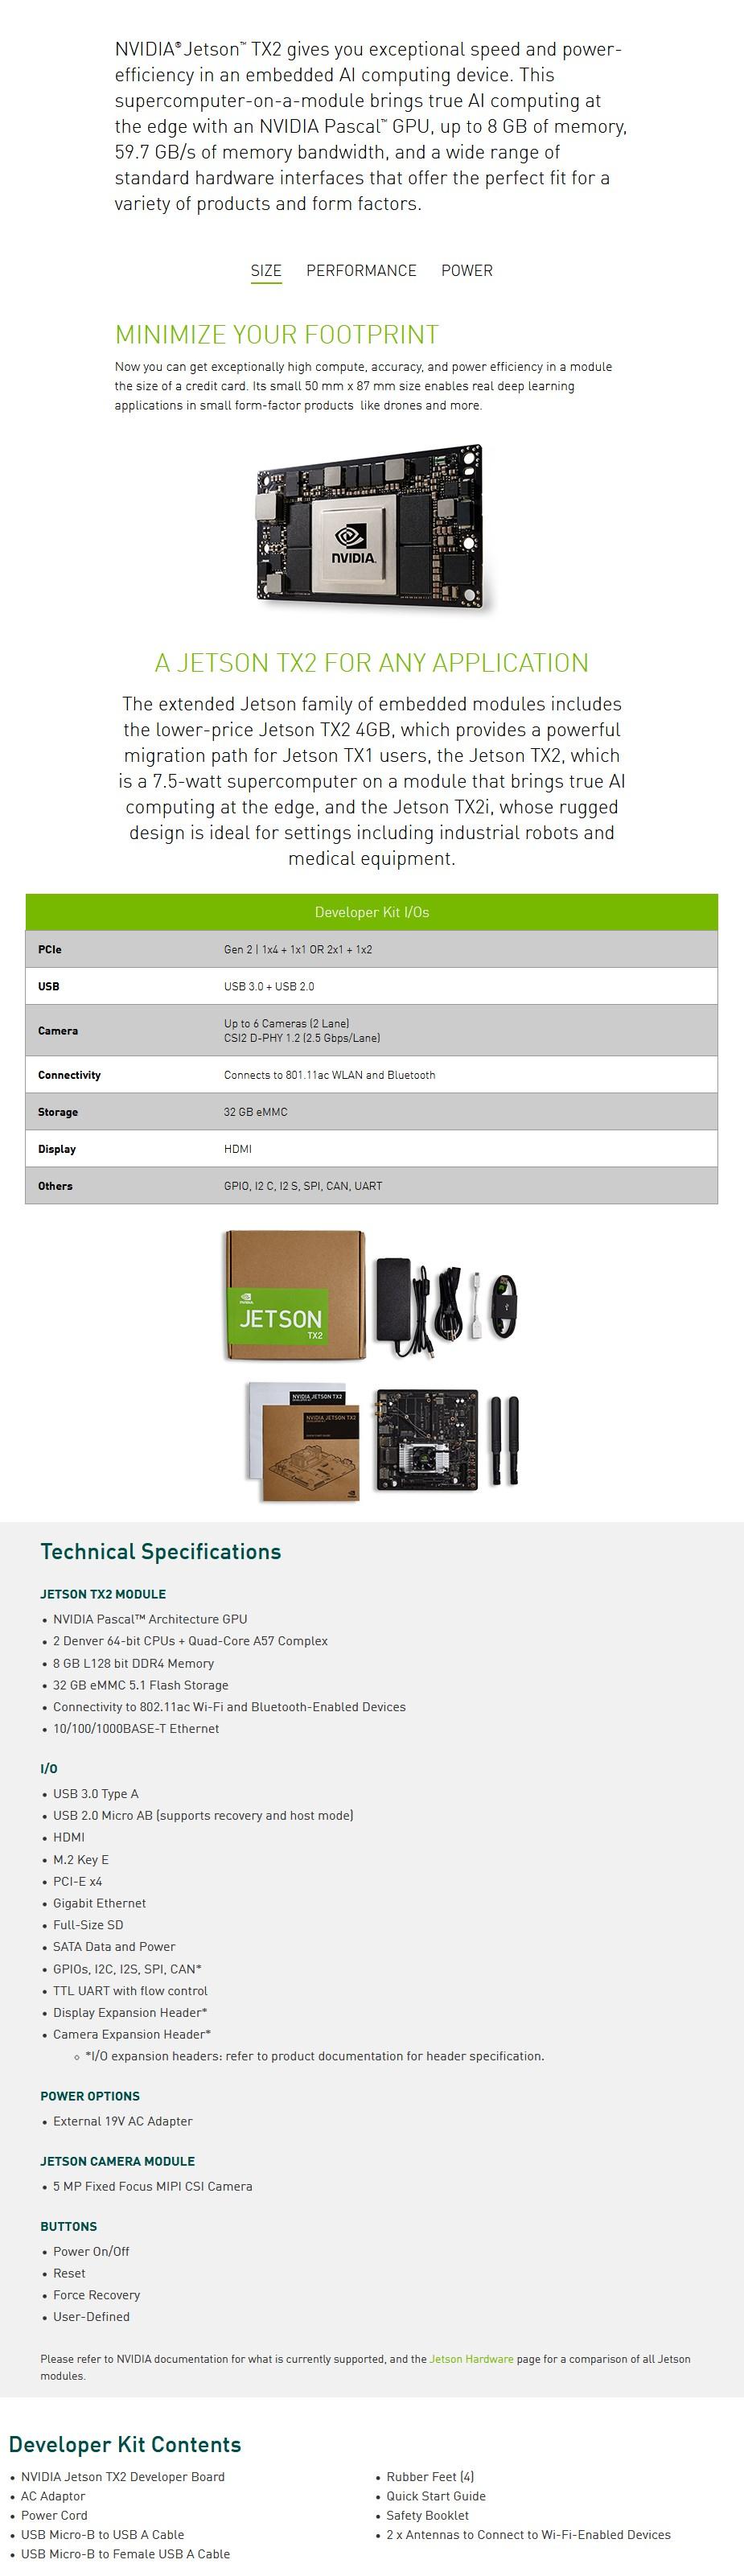 Nvidia Jetson TX2 Tegra Developer Kit - Overview 1